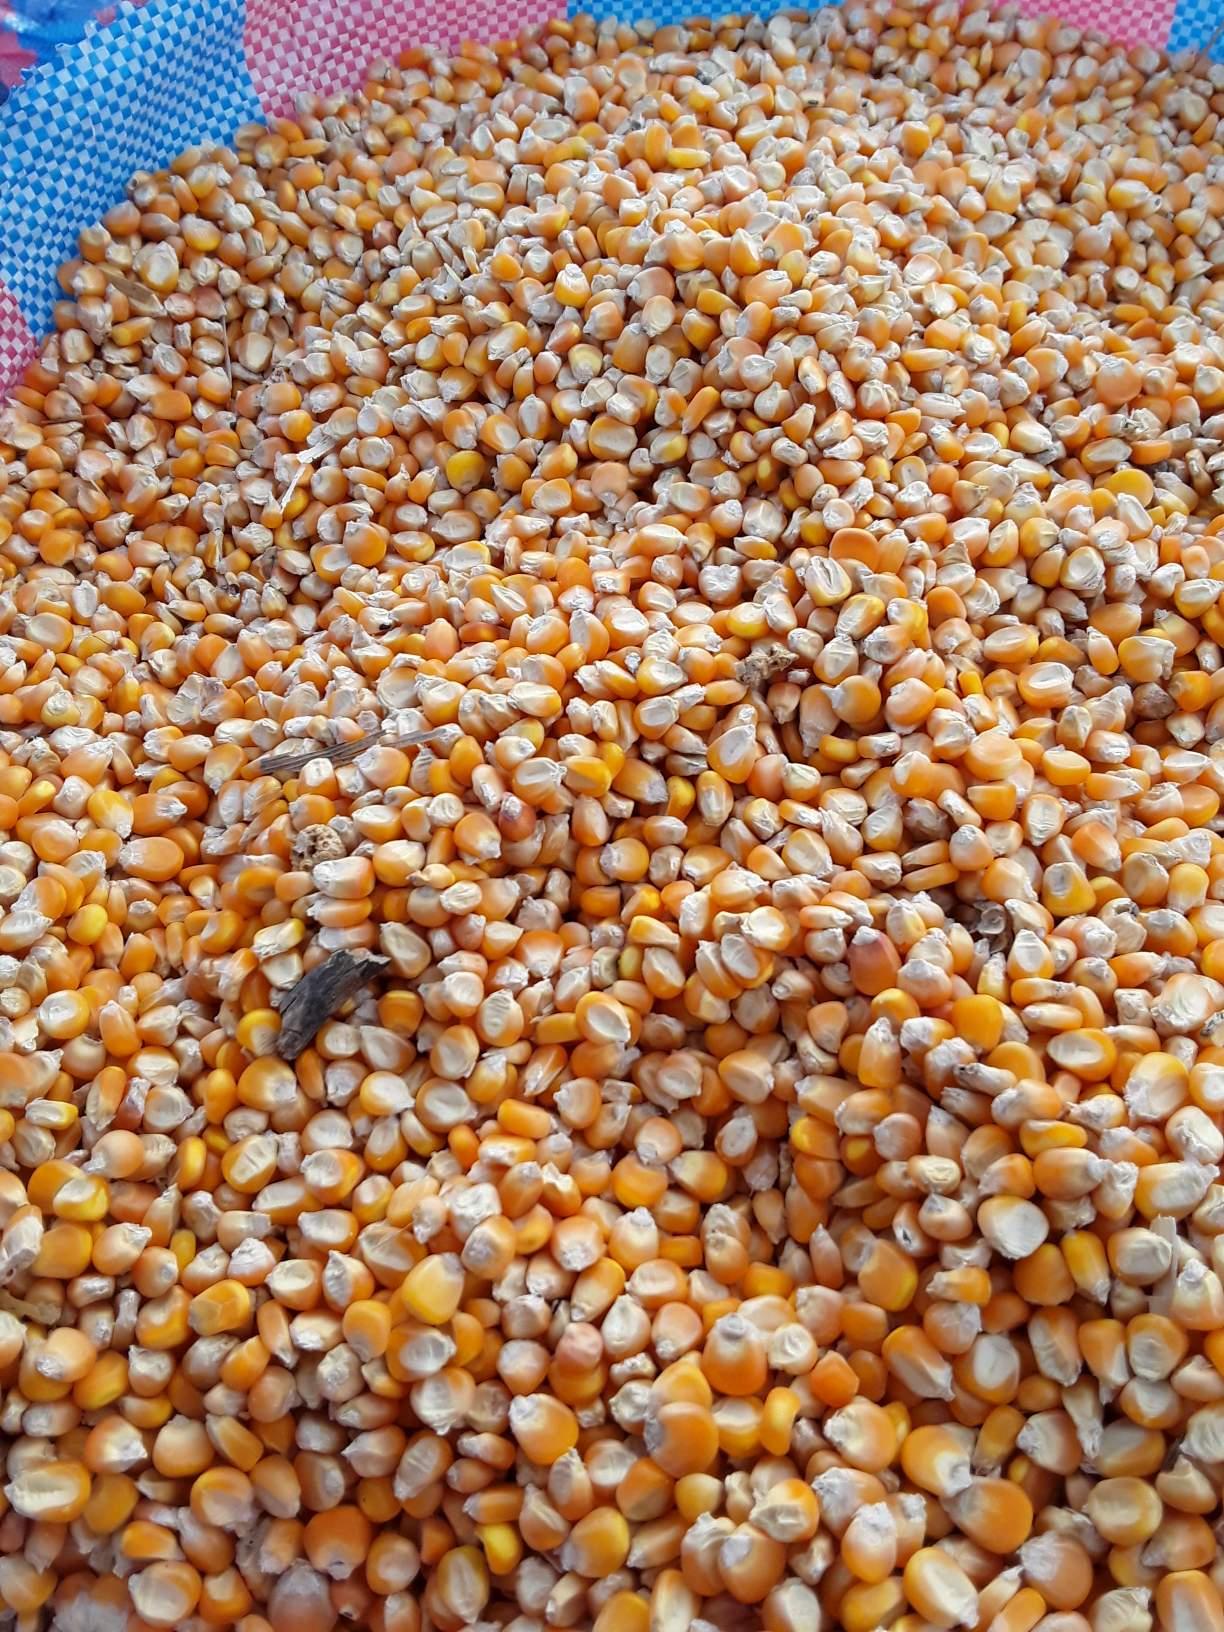 Nzara-produits agricoles-maïs